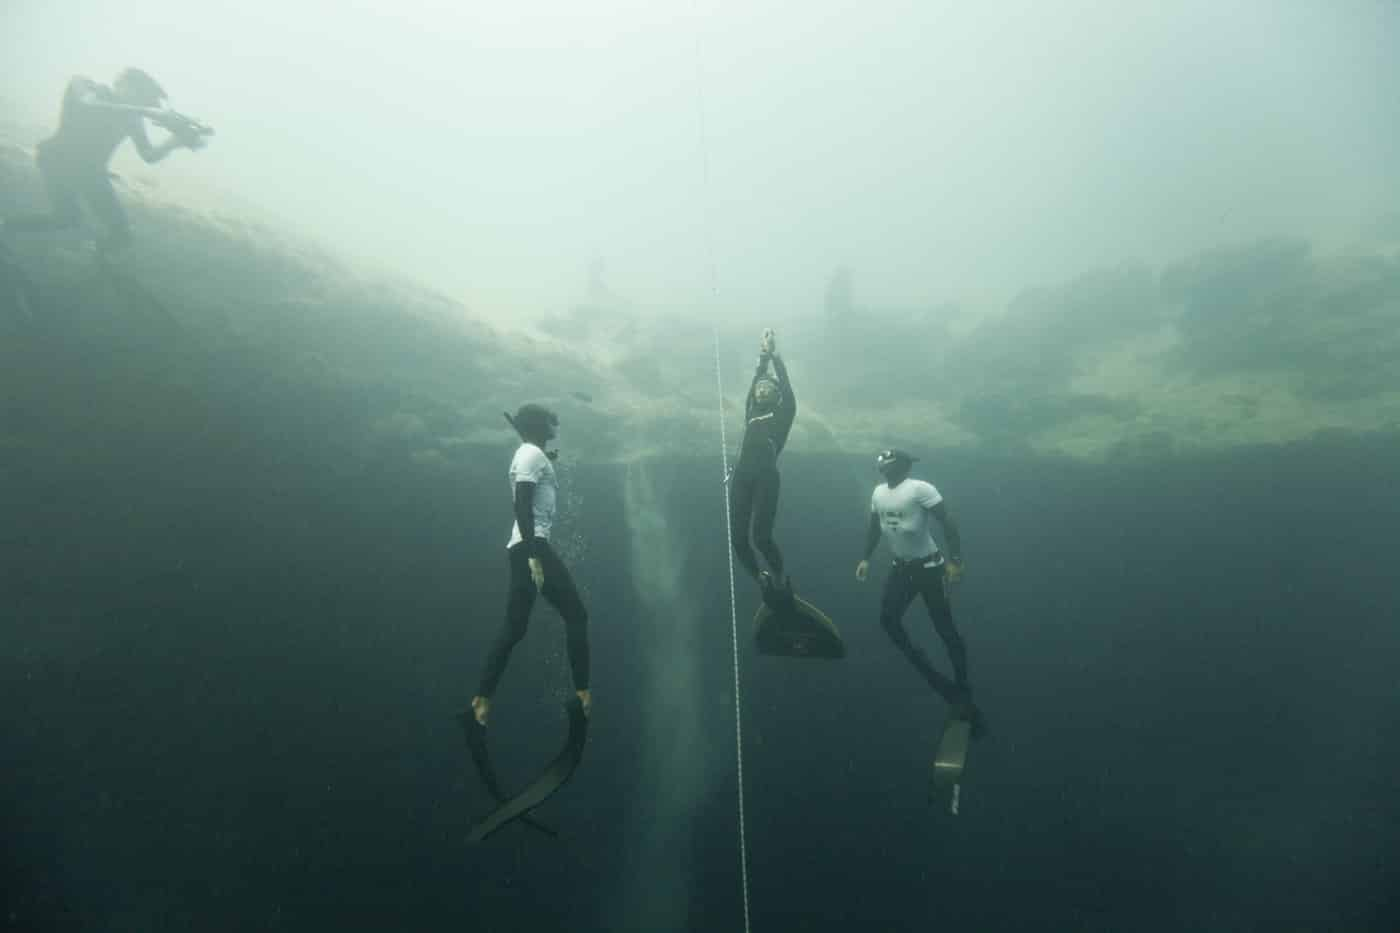 freediving-bubble-tetsuo-hara-diving